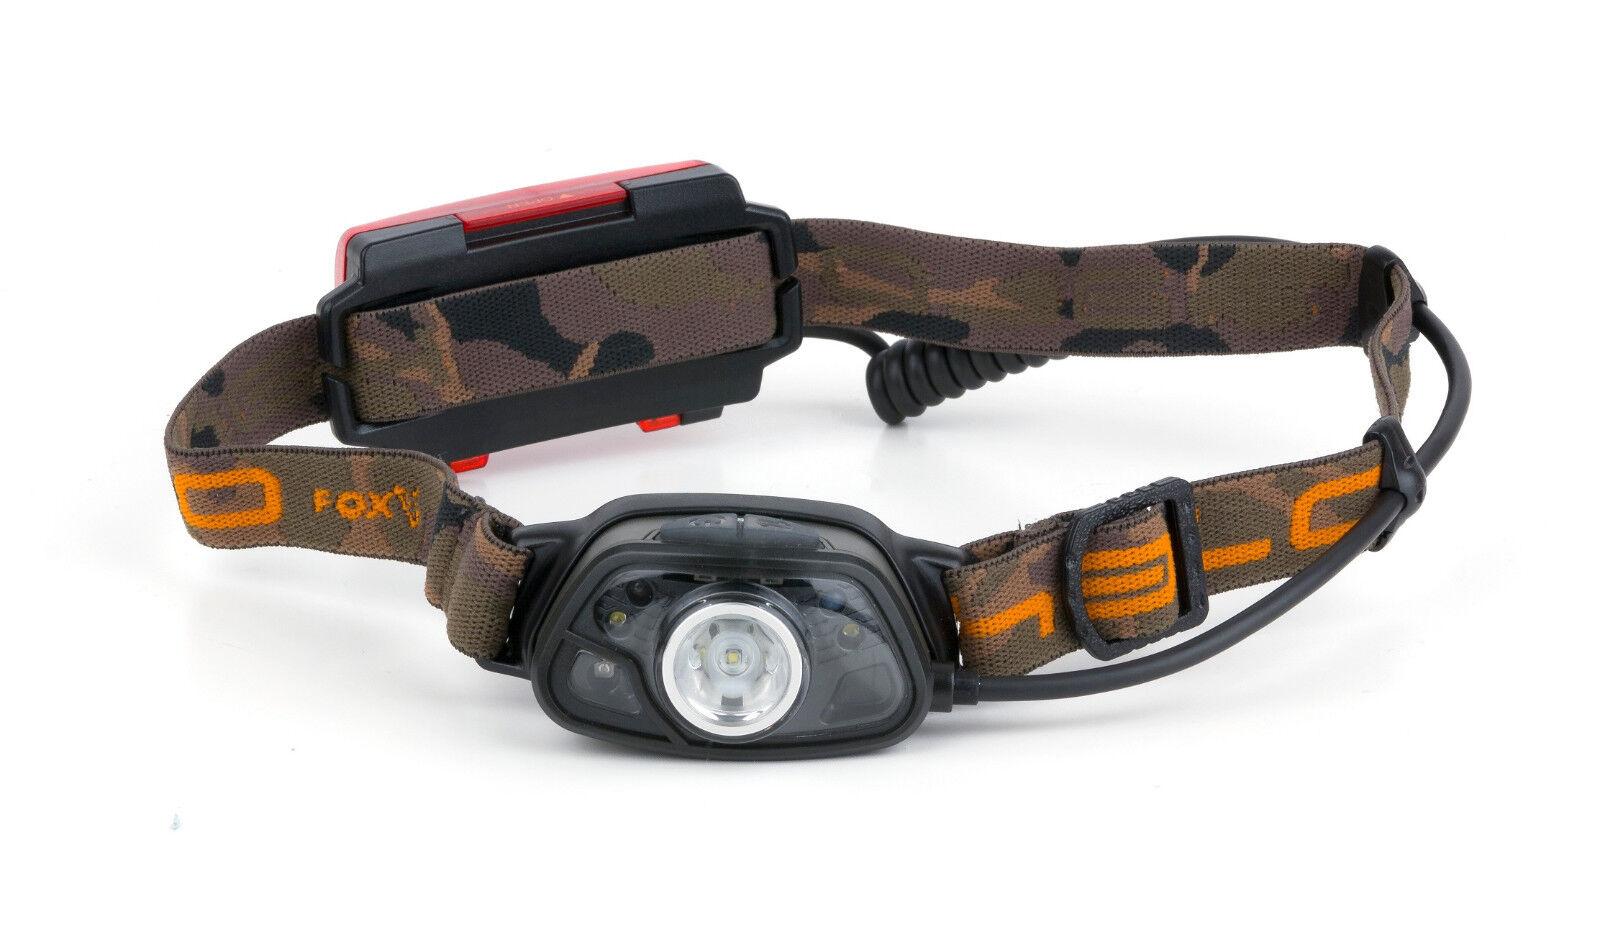 Fox Halo MS 250 Headtorch CEI162 Kopflampe Lampe Lamp Head Torch Angellampe